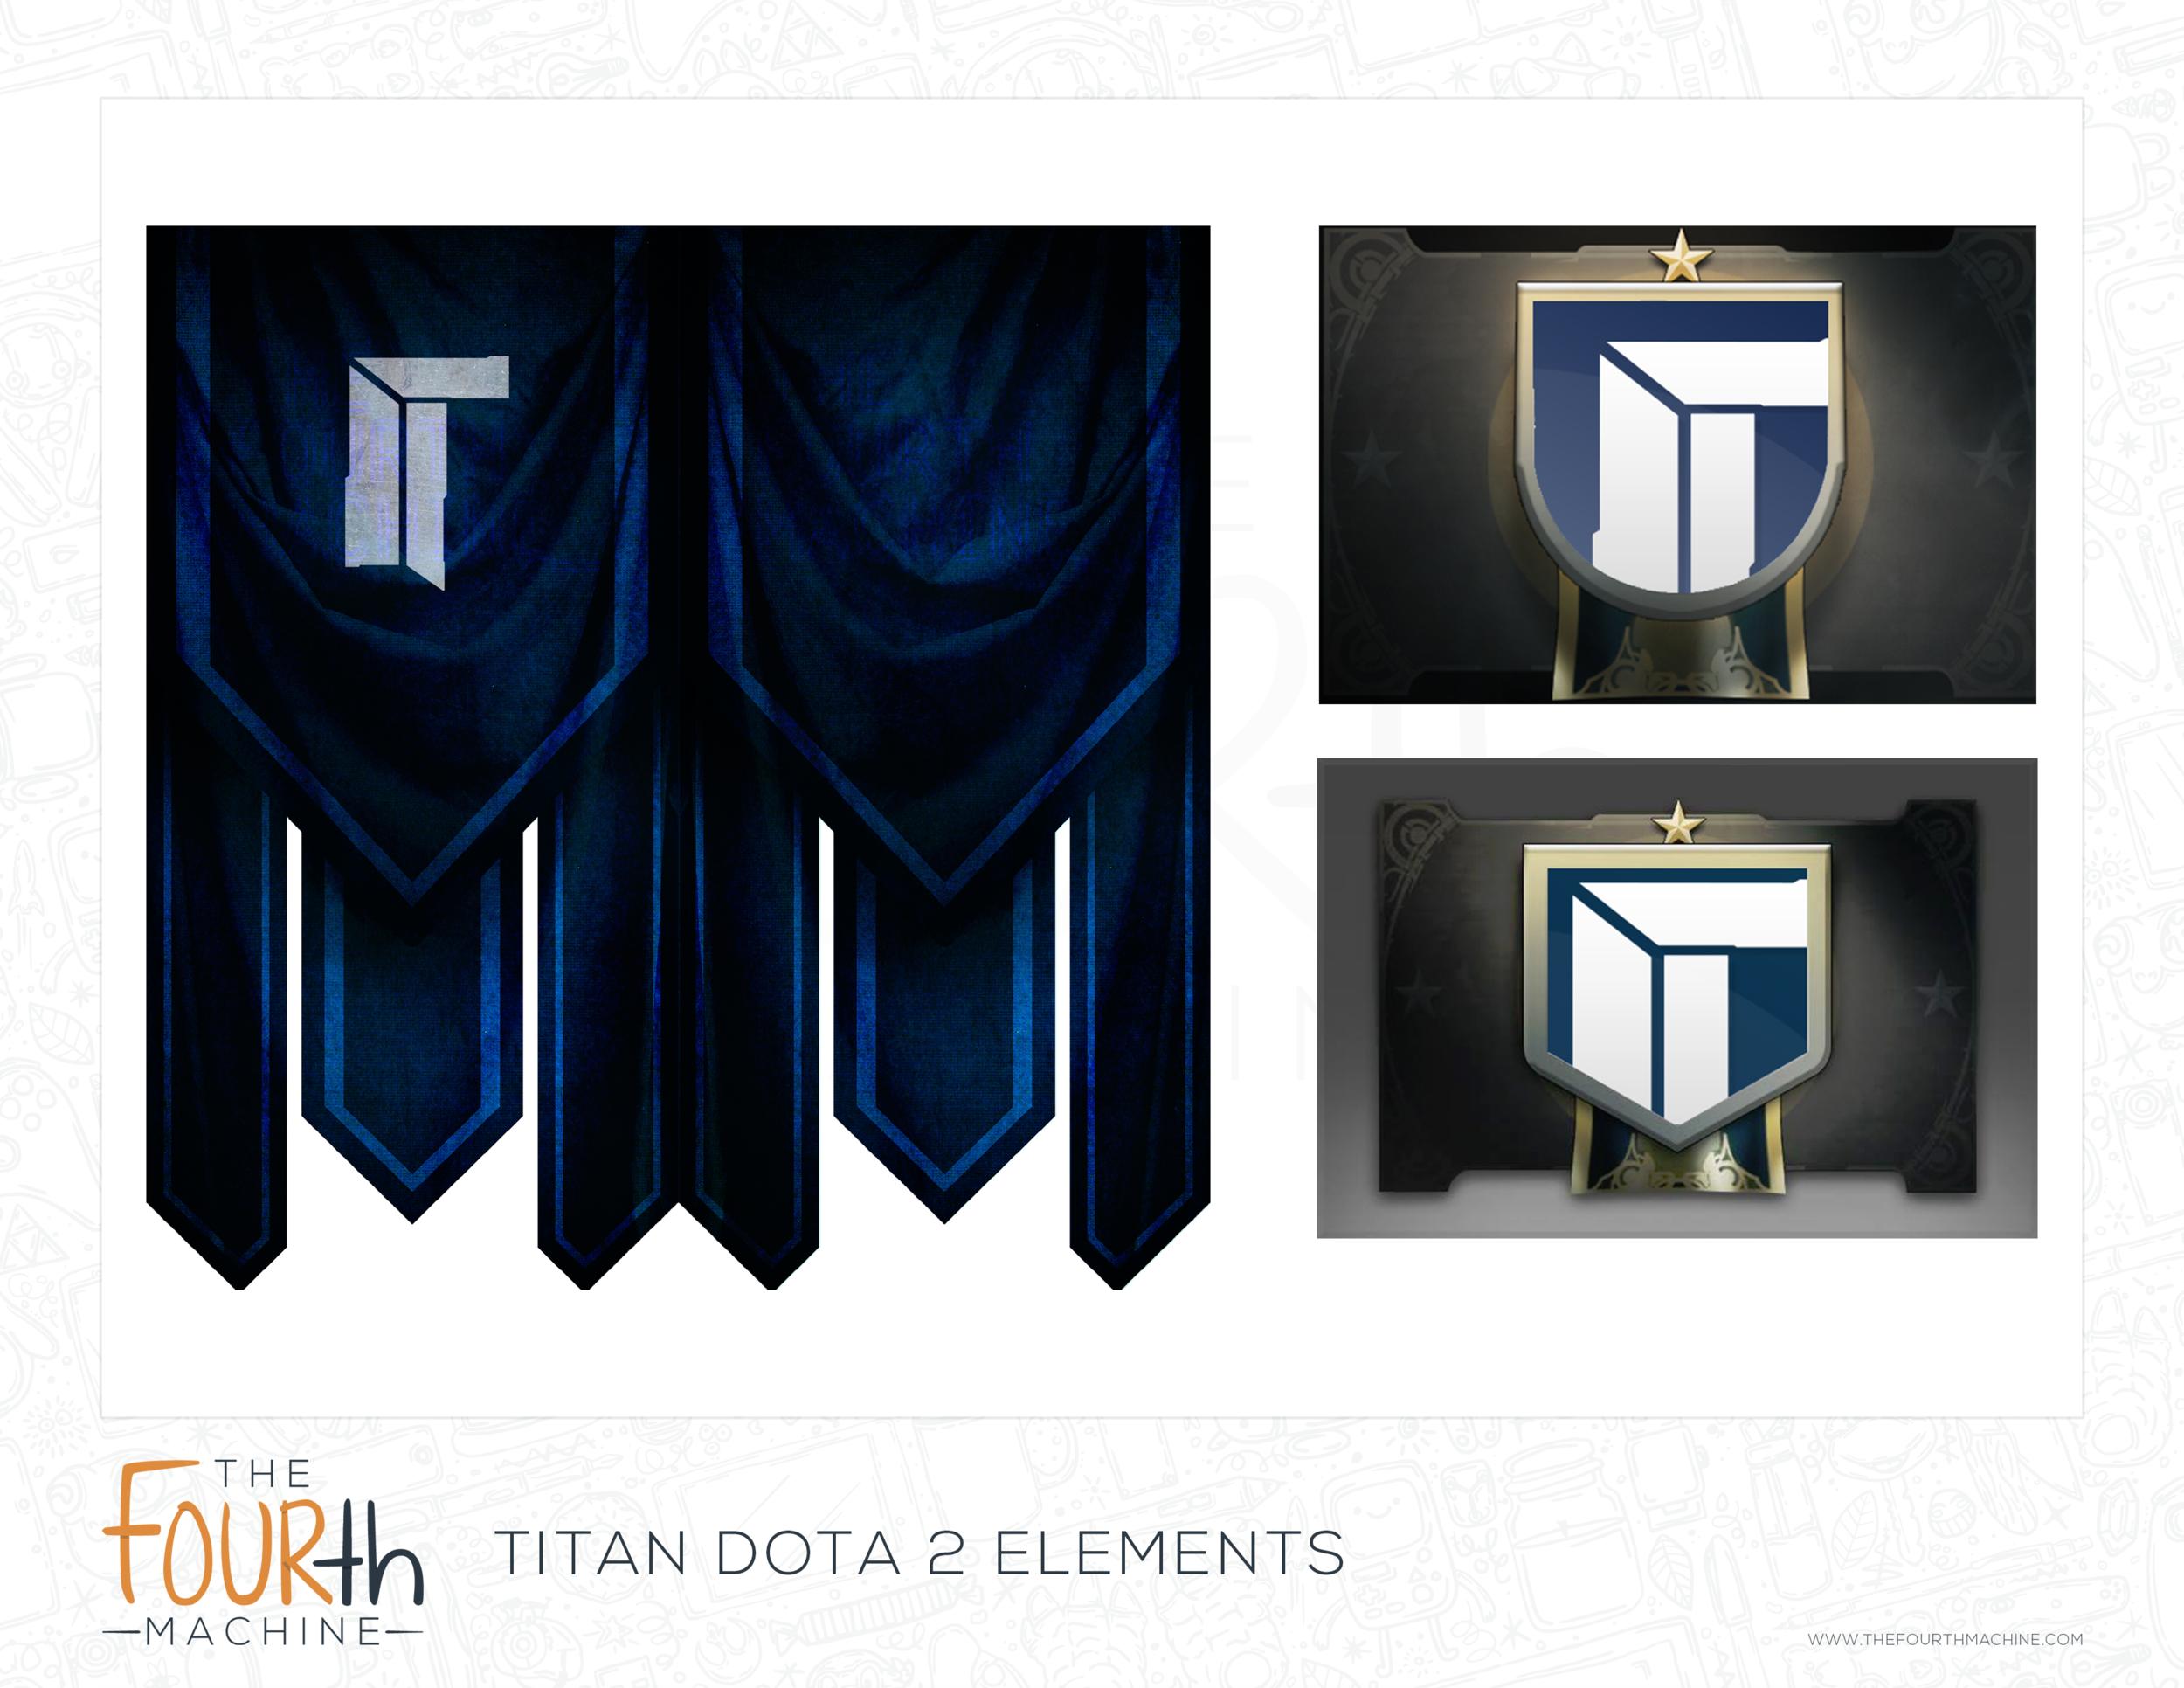 Titan_DOTA2_Elements.png